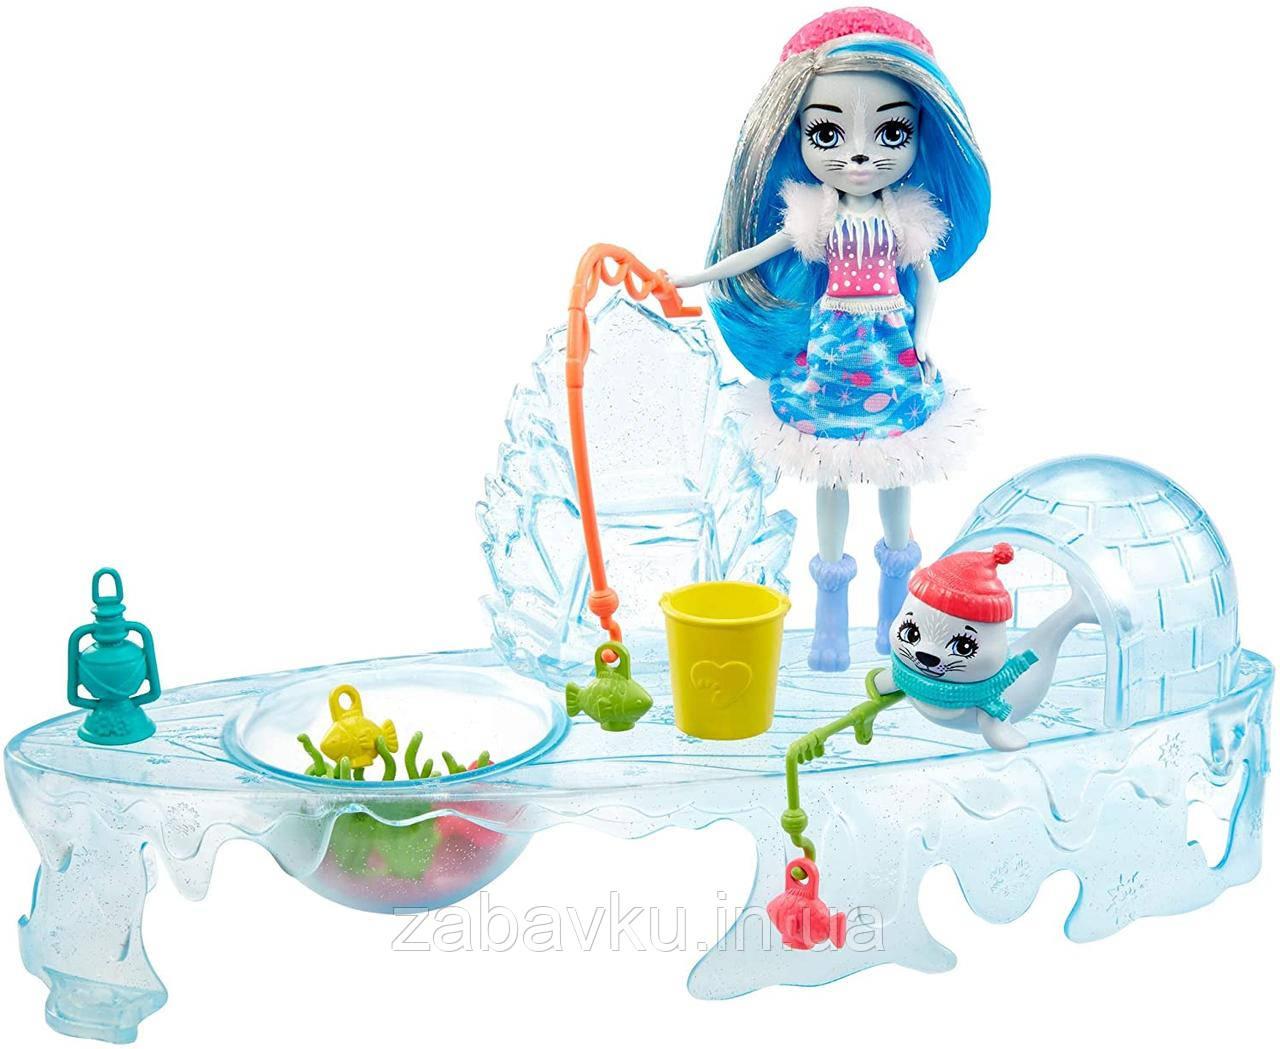 Enchantimals Fishing Friends Sashay Seal Энчантималс набор зимняя рыбалка кукла Тюлень Енчантімалс